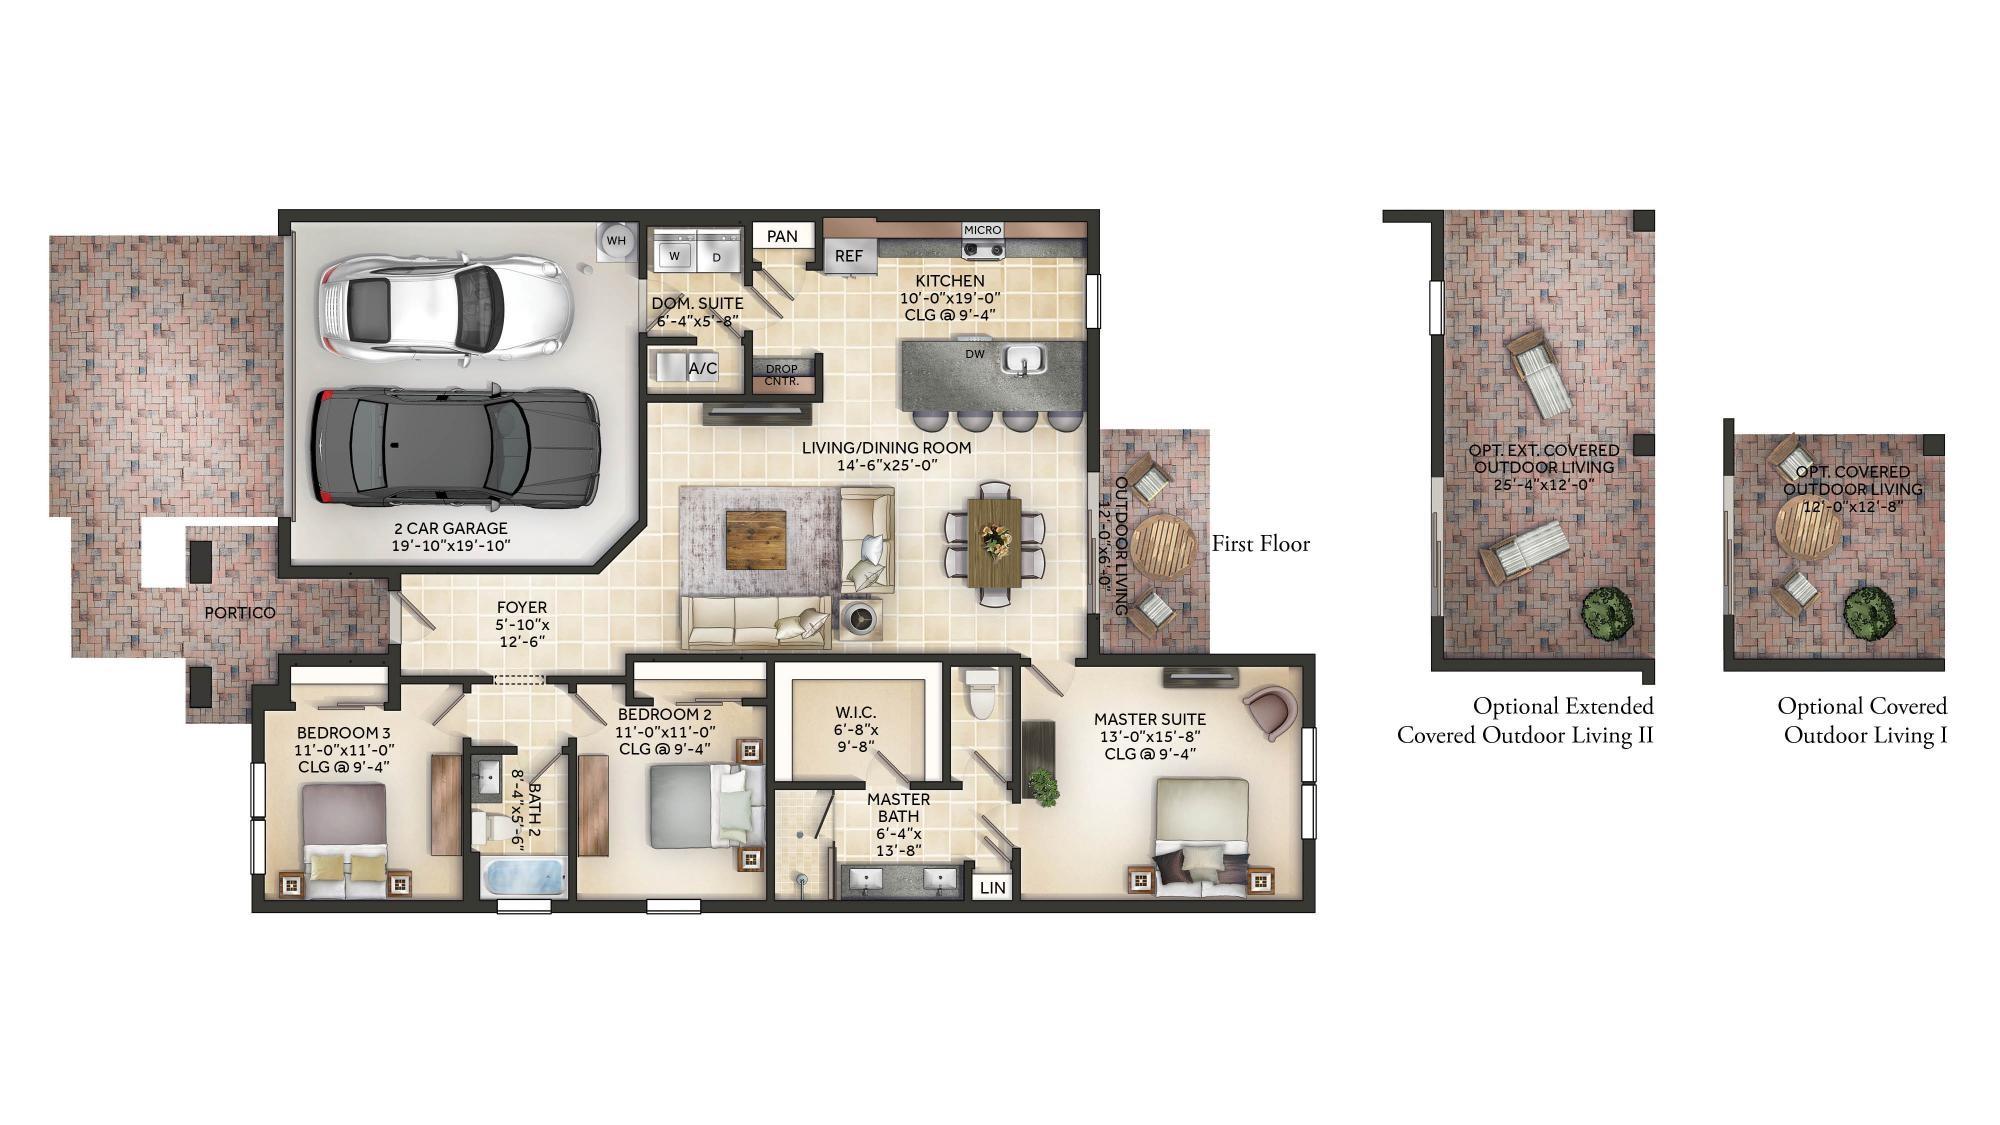 dupree_floorplan.jpg